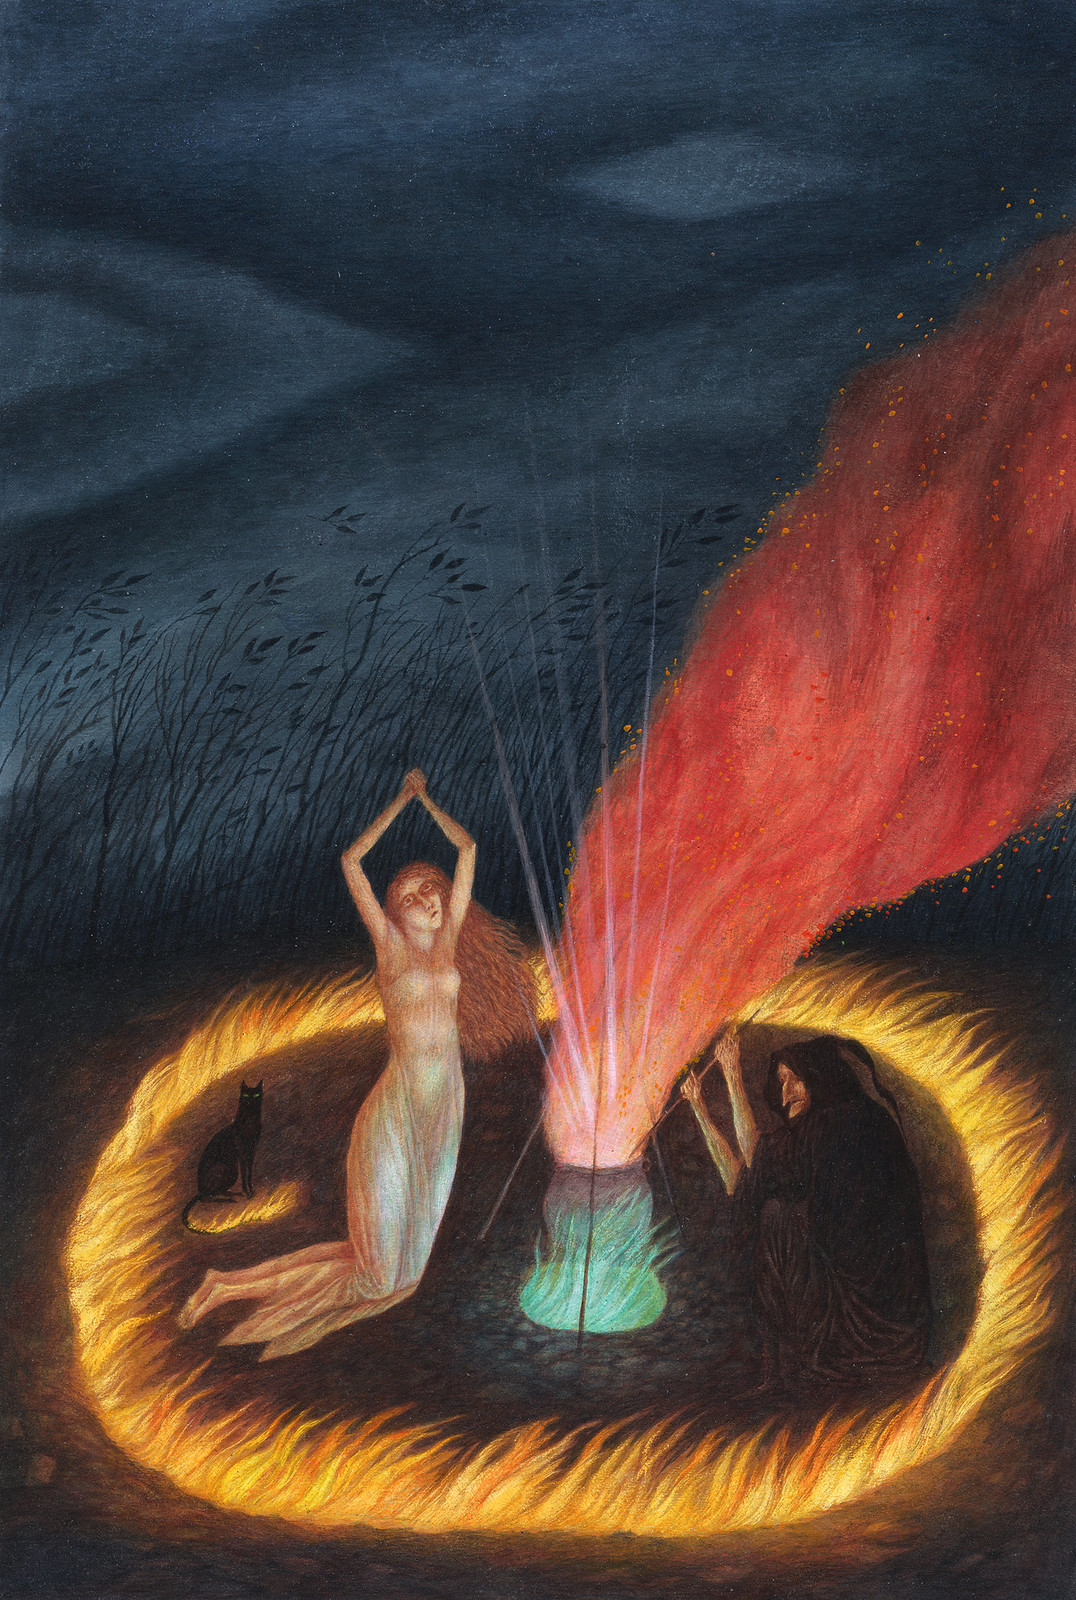 Jindra Capek - The Golden Pot, Illustration 1